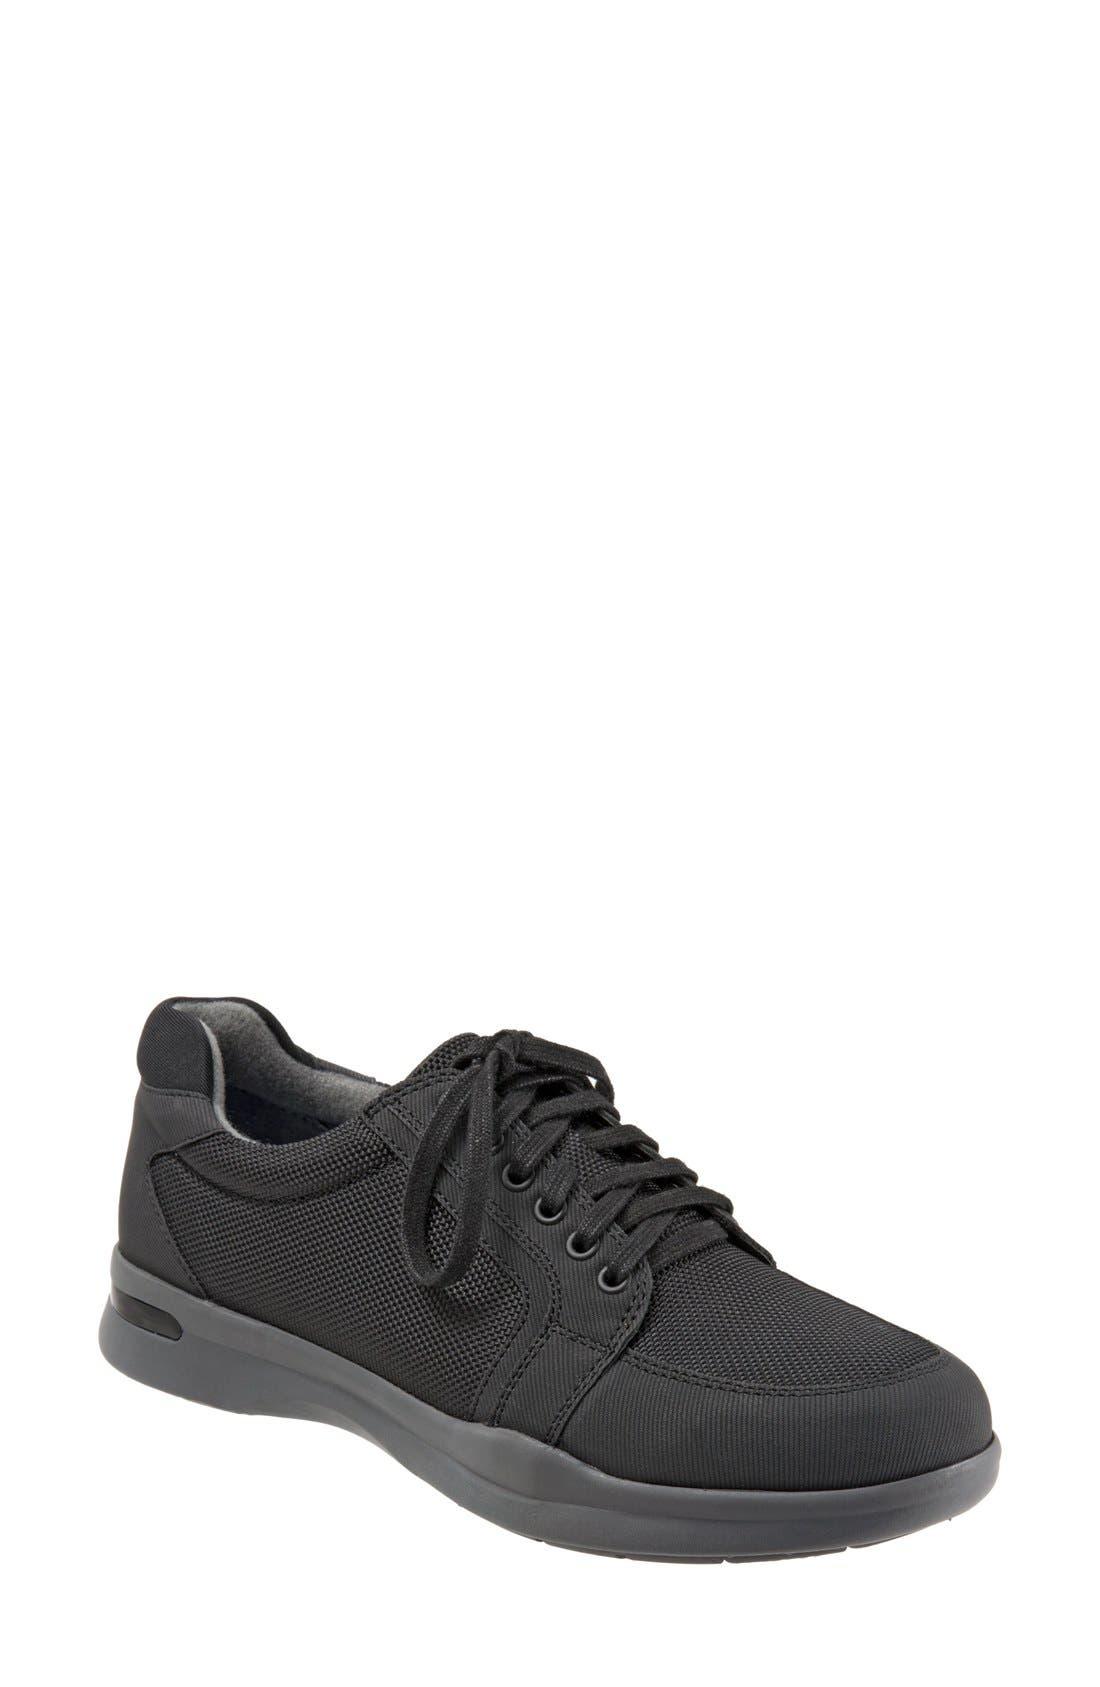 'Vital' Sneaker,                             Main thumbnail 1, color,                             BLACK